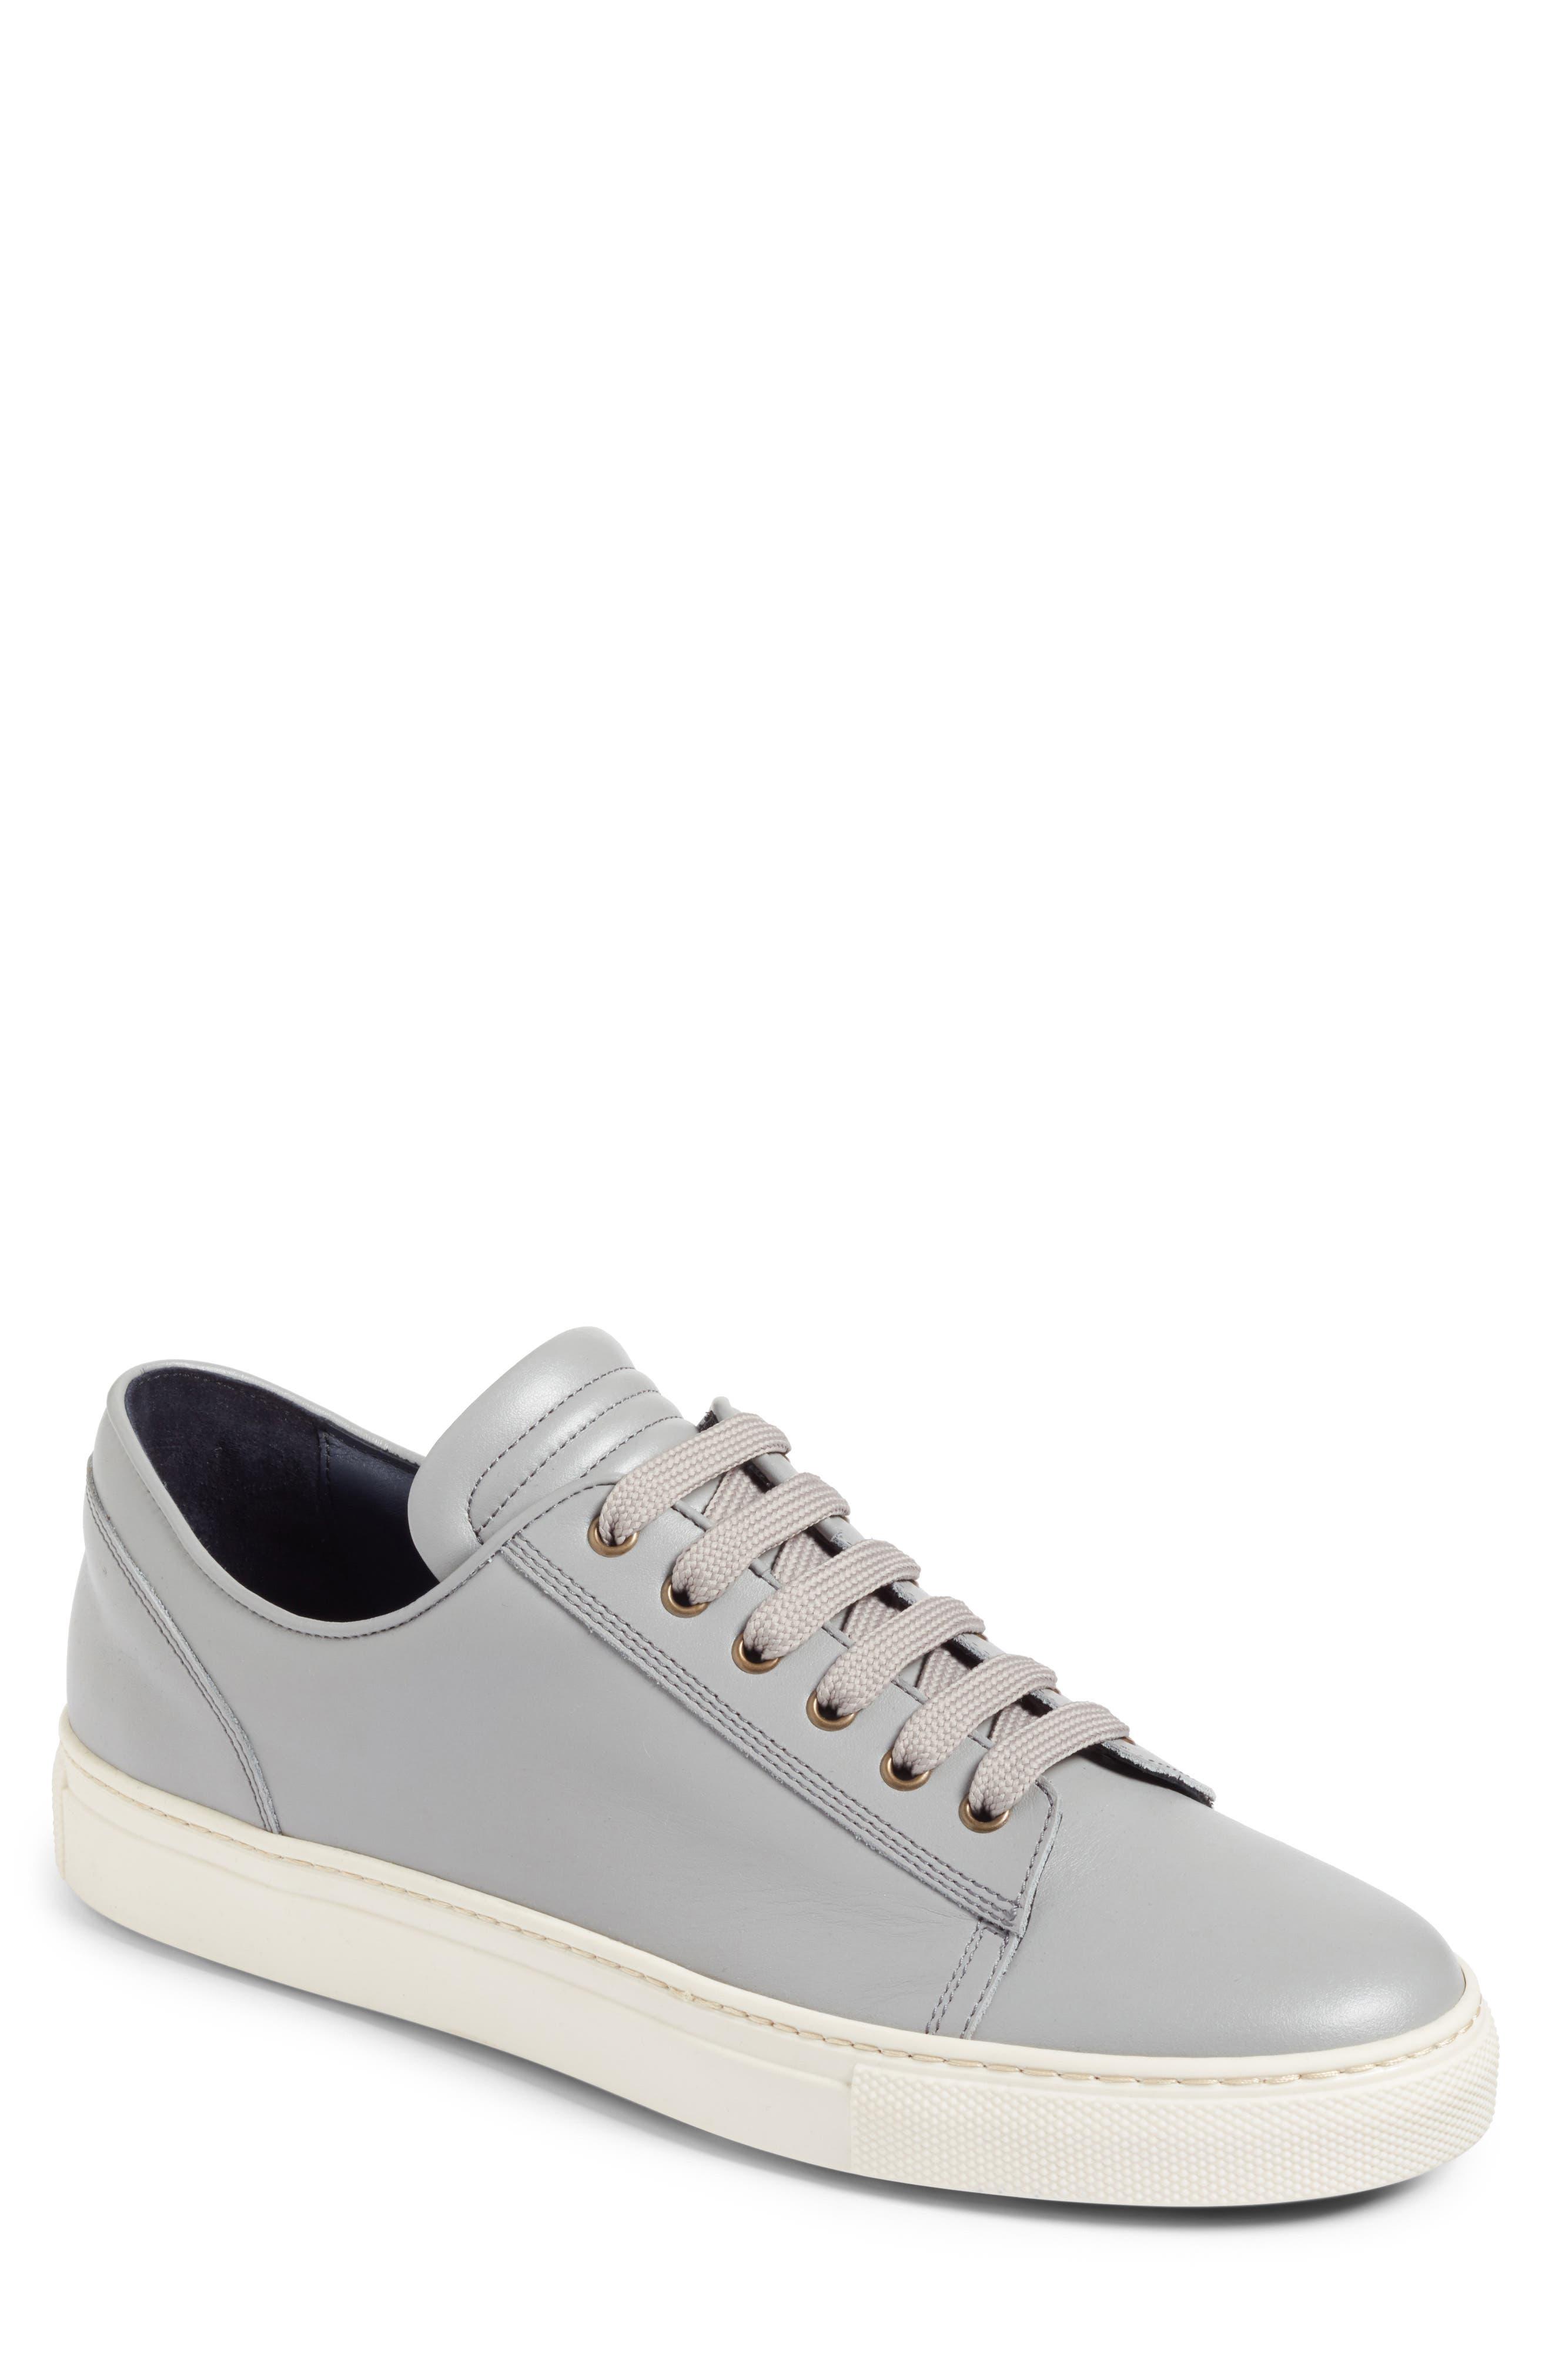 Taranto Sneaker,                             Main thumbnail 1, color,                             020